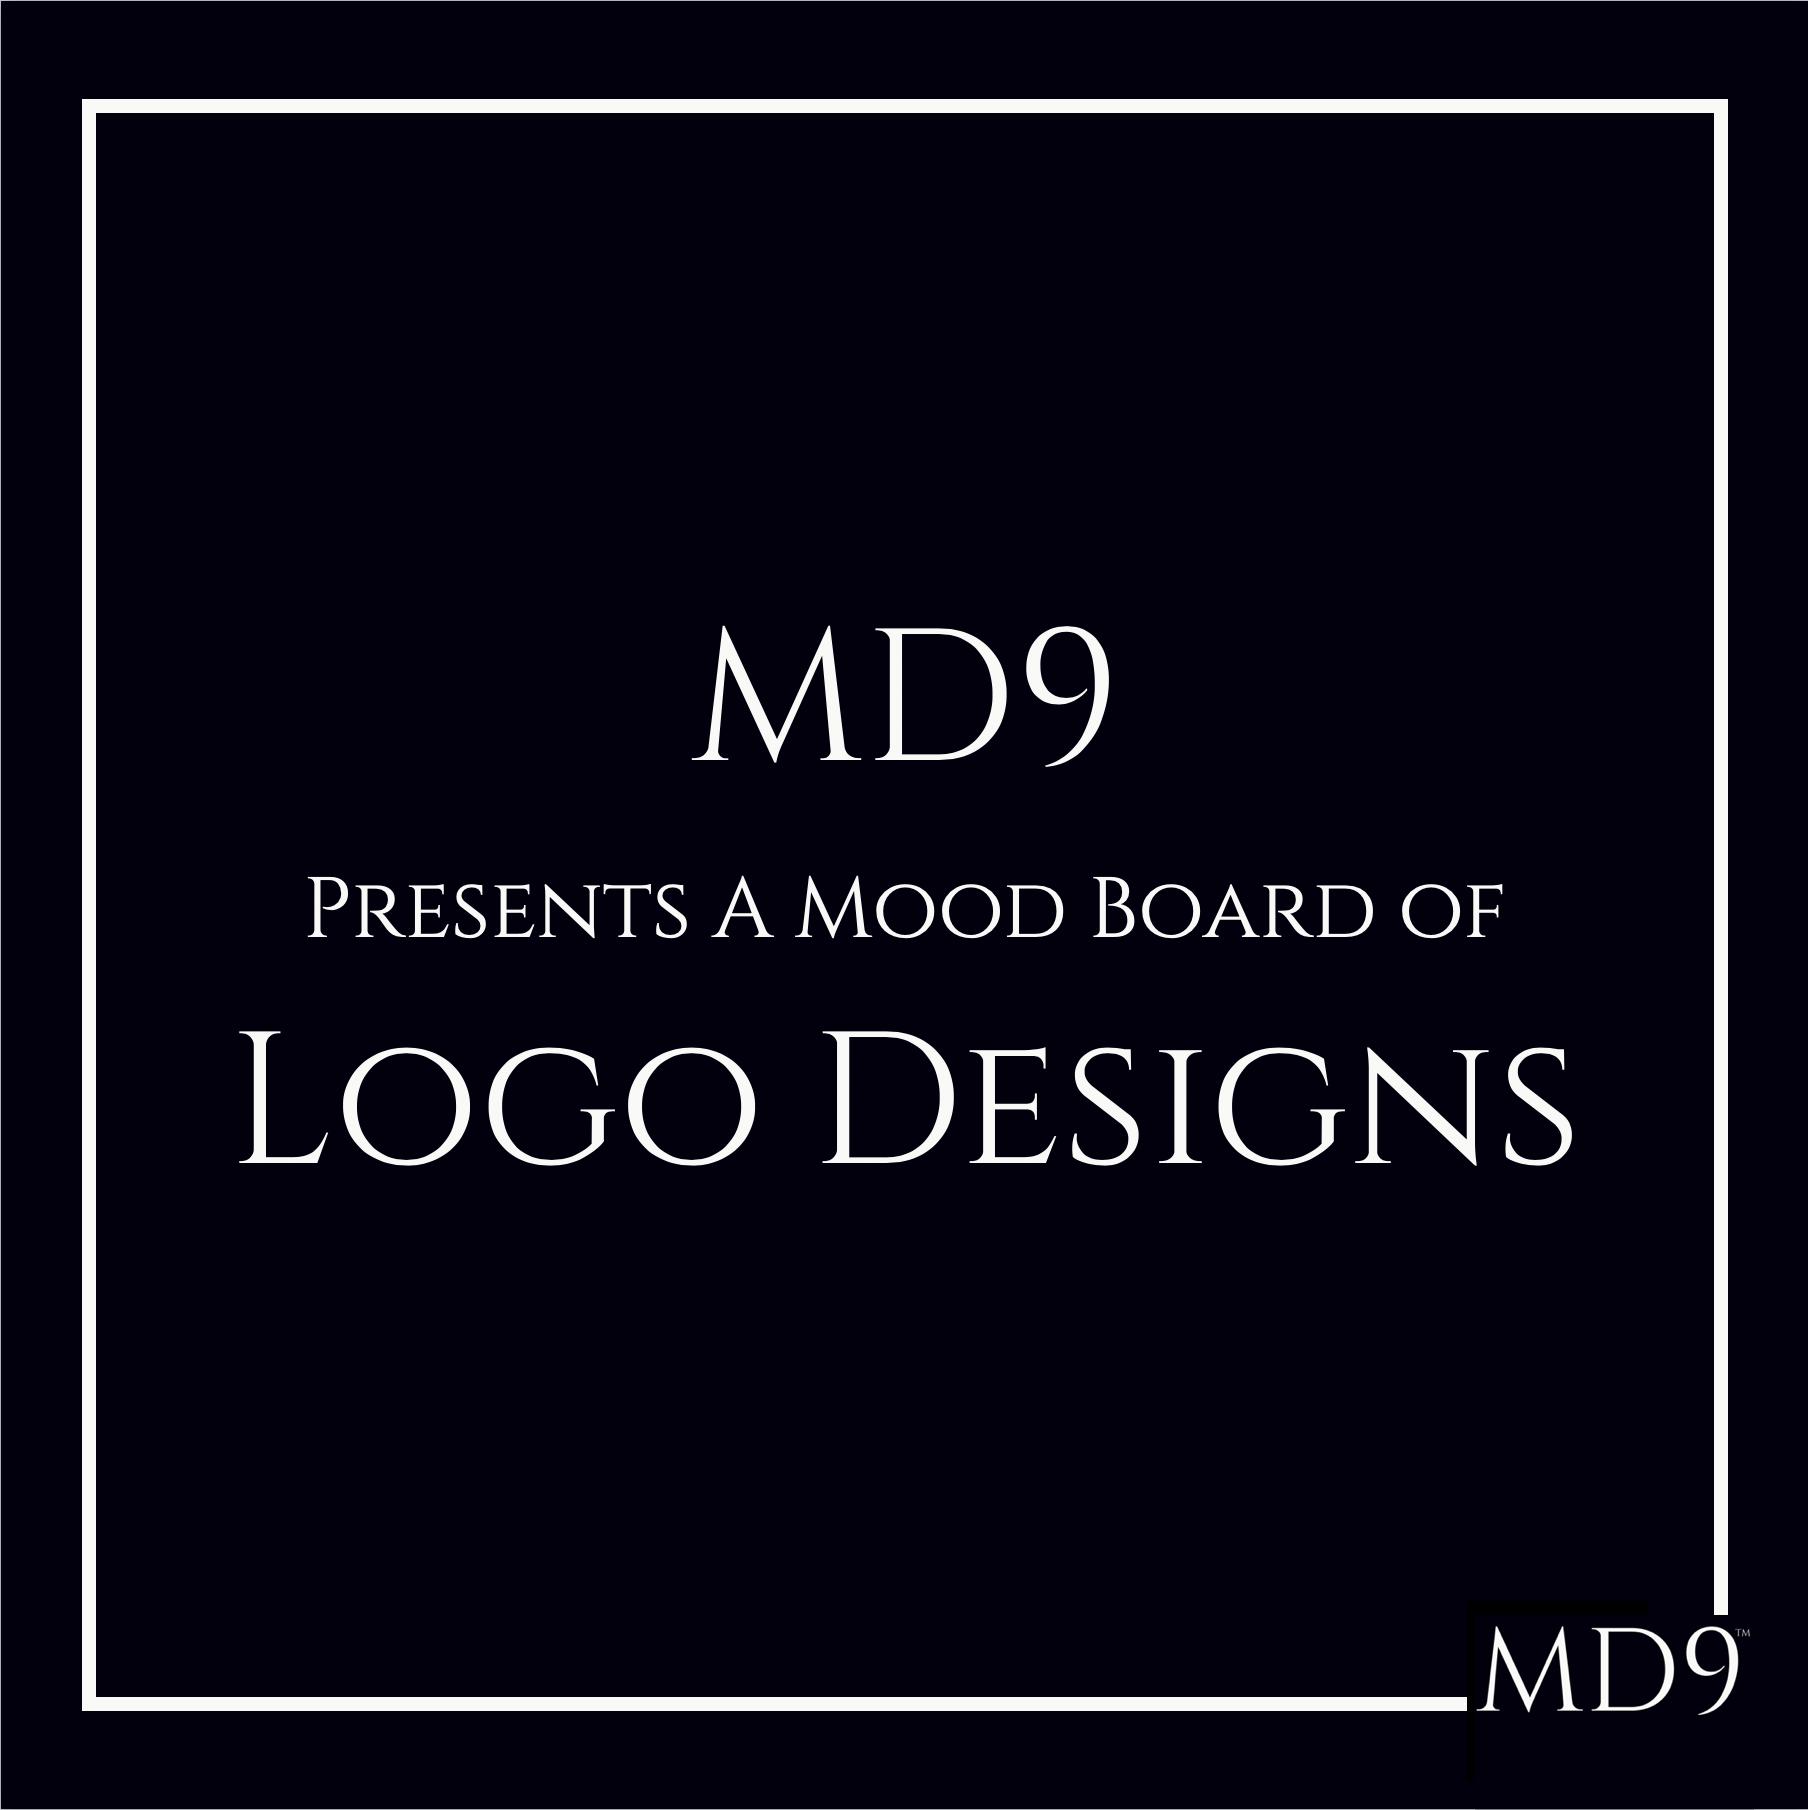 MD9's Design Mood Board – Logos